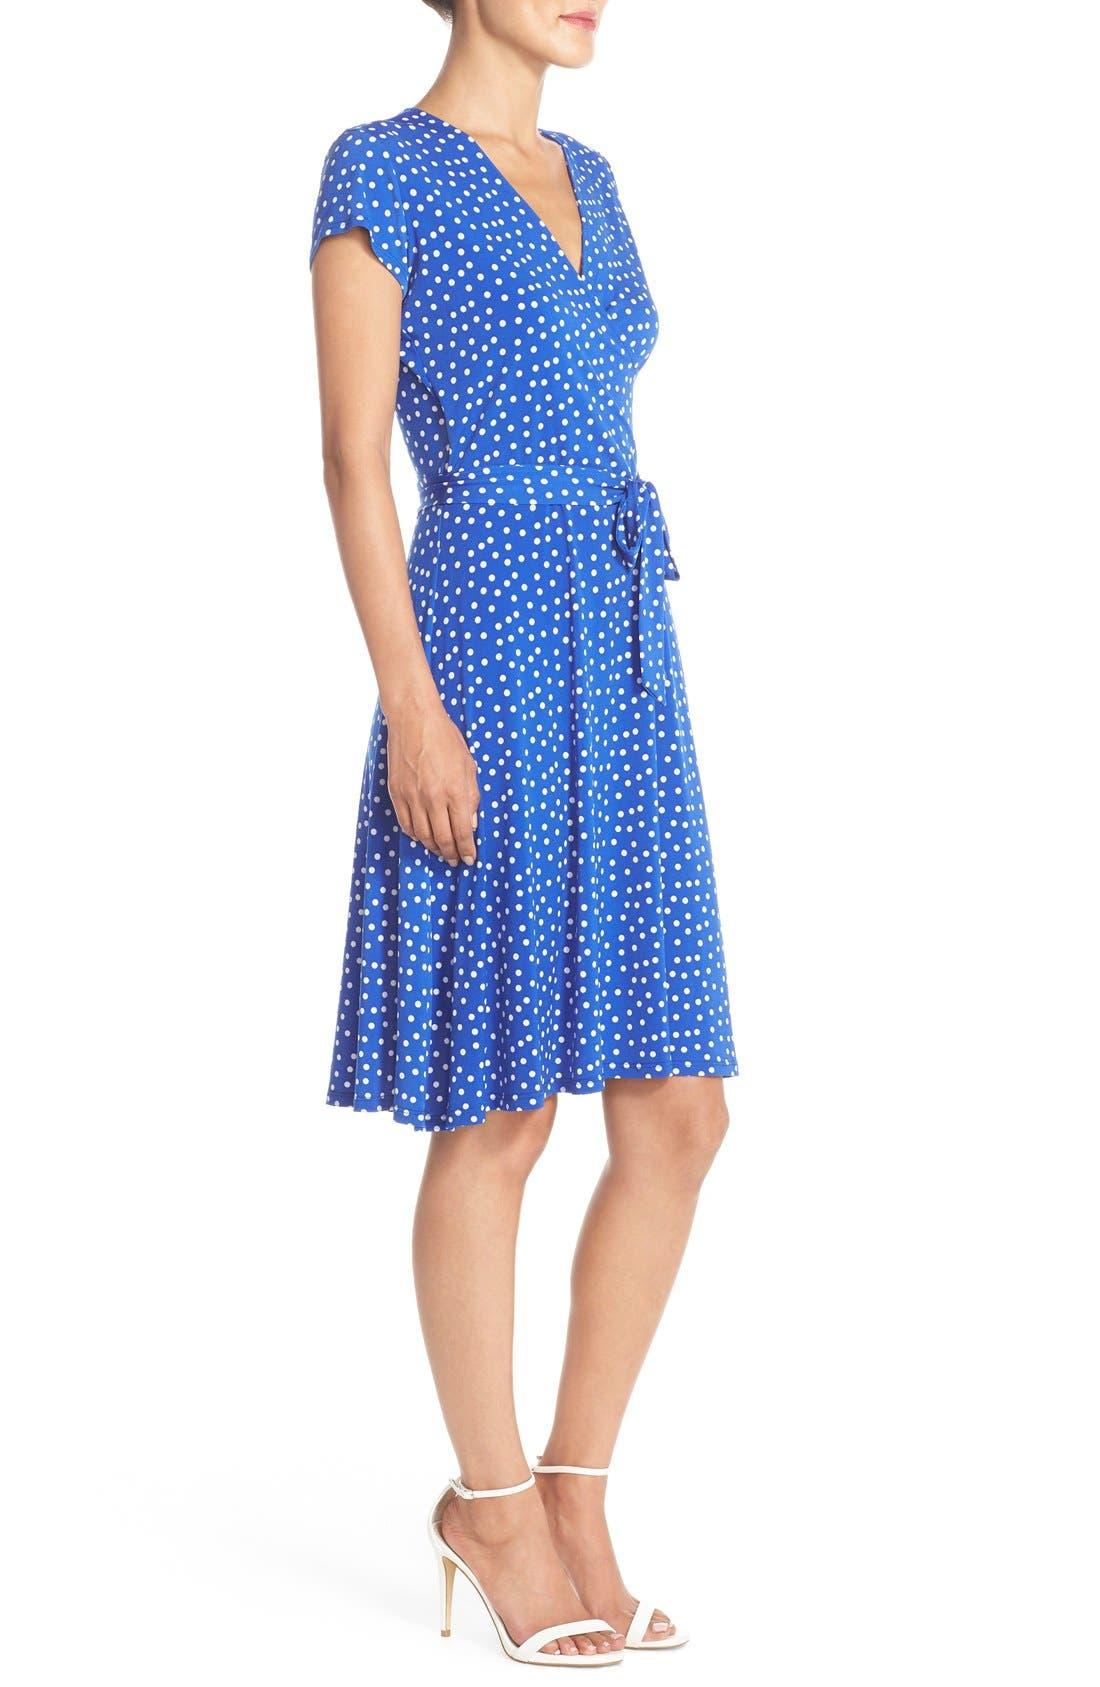 Alternate Image 3  - Leota 'Perfect' Faux Wrap Polka Dot Jersey Dress